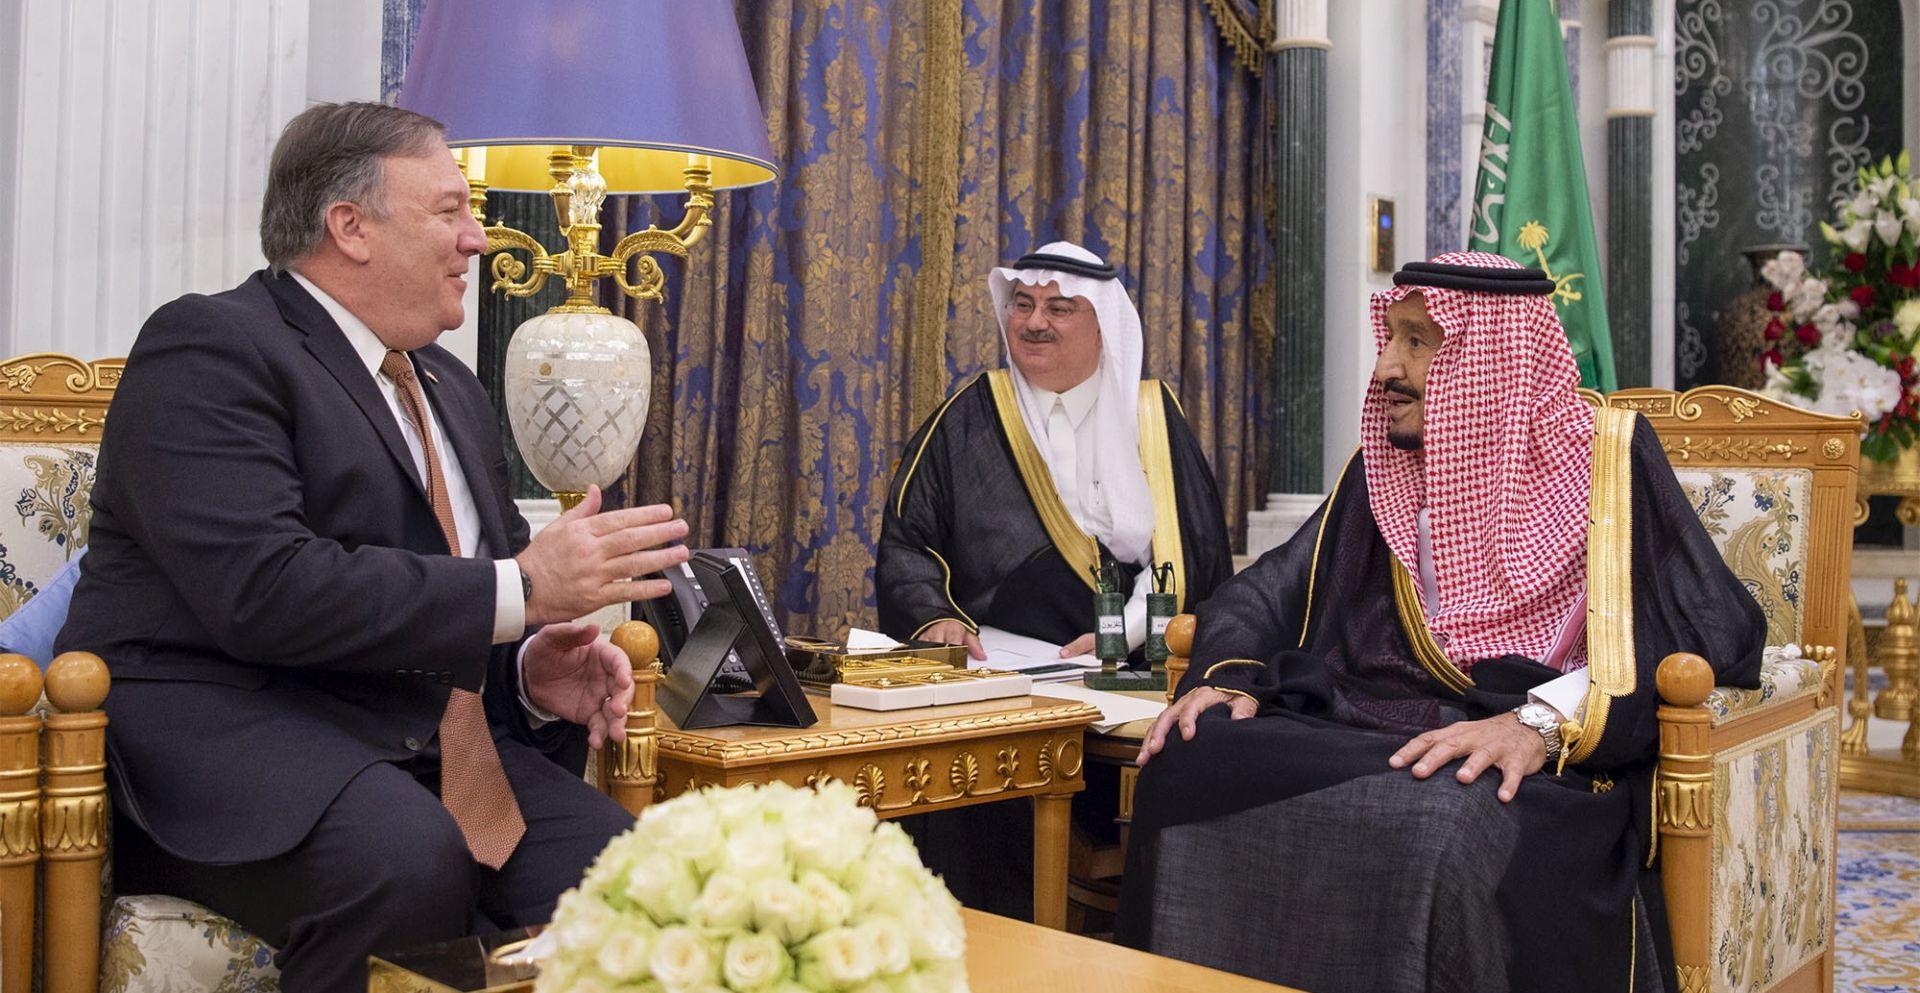 Saudijska Arabija, ključni igrač na Bliskom istoku